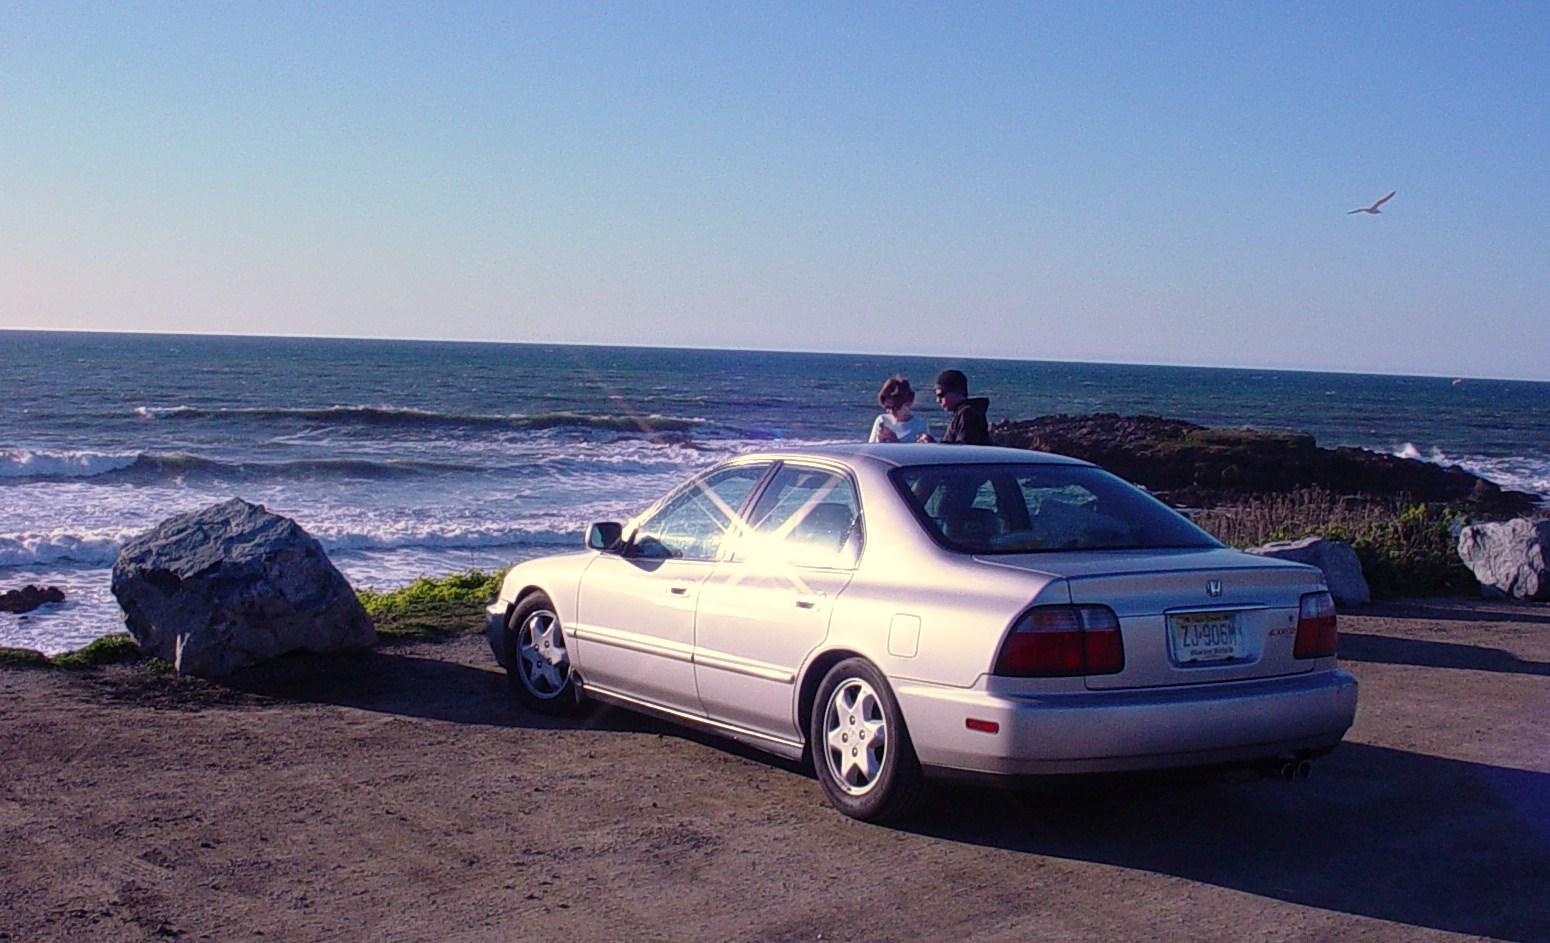 1996 Honda Accord EX V6, 1996 Honda Accord 4 Dr EX V6 Sedan picture, exterior